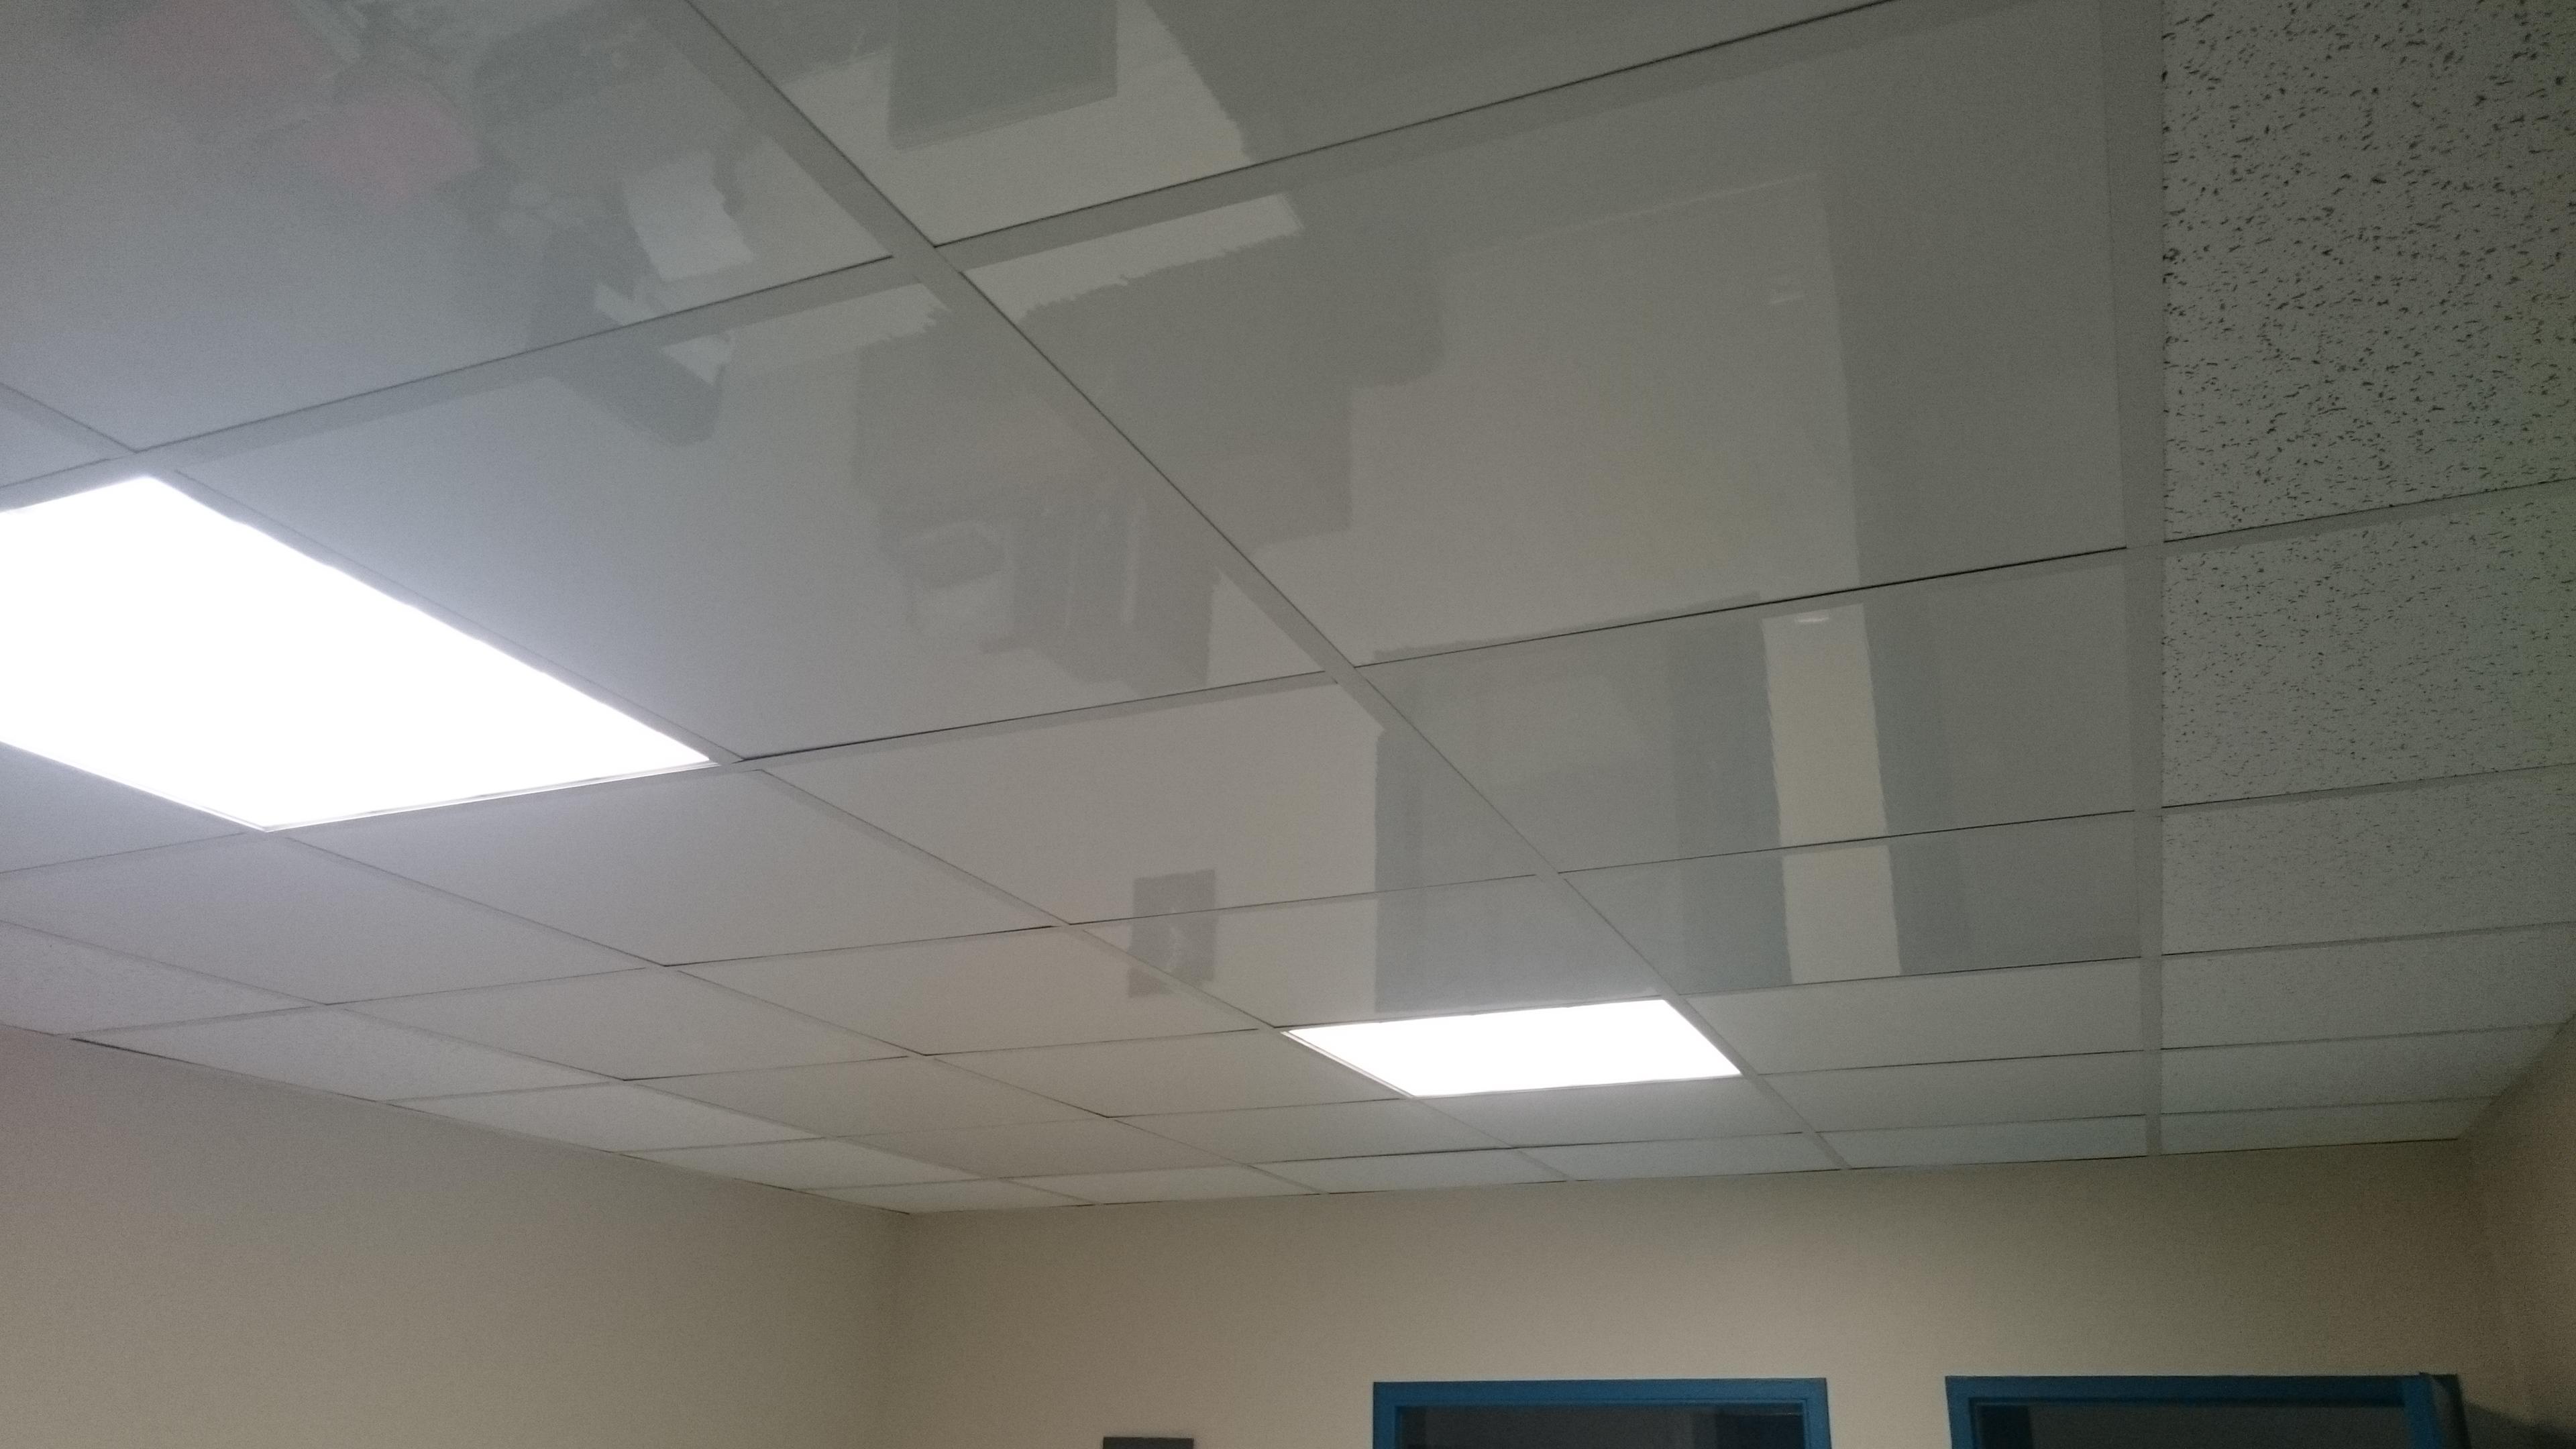 fabulous interesting cool dalle plafond suspendu brico depot with lambris pvc plafond brico depot with faux plafond lambris pvc with lambris pvc plafond